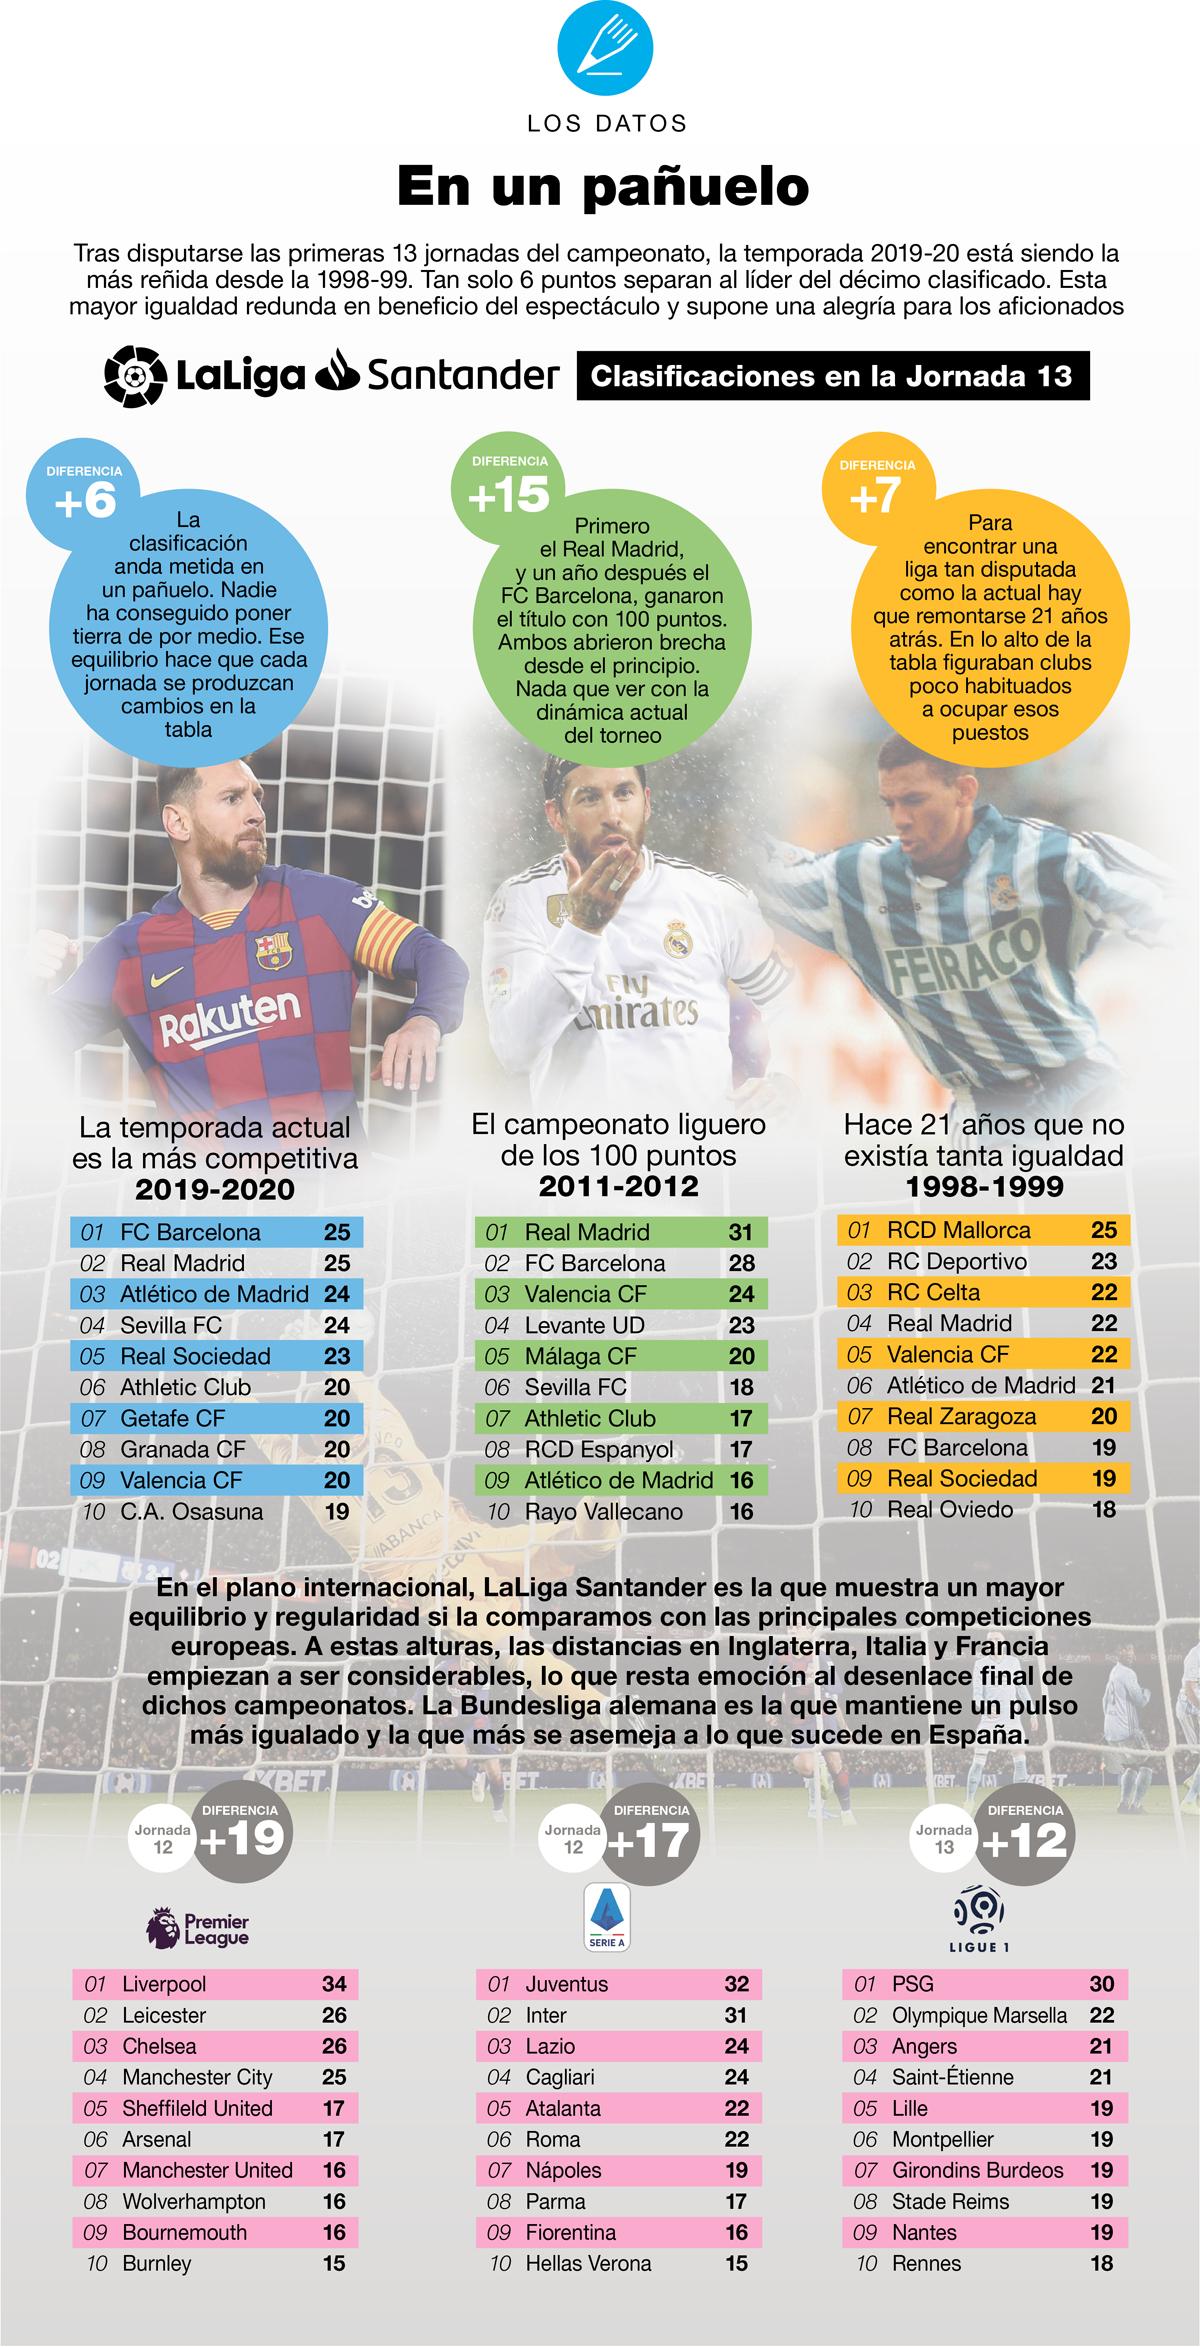 La competitividad de LaLiga Santander.